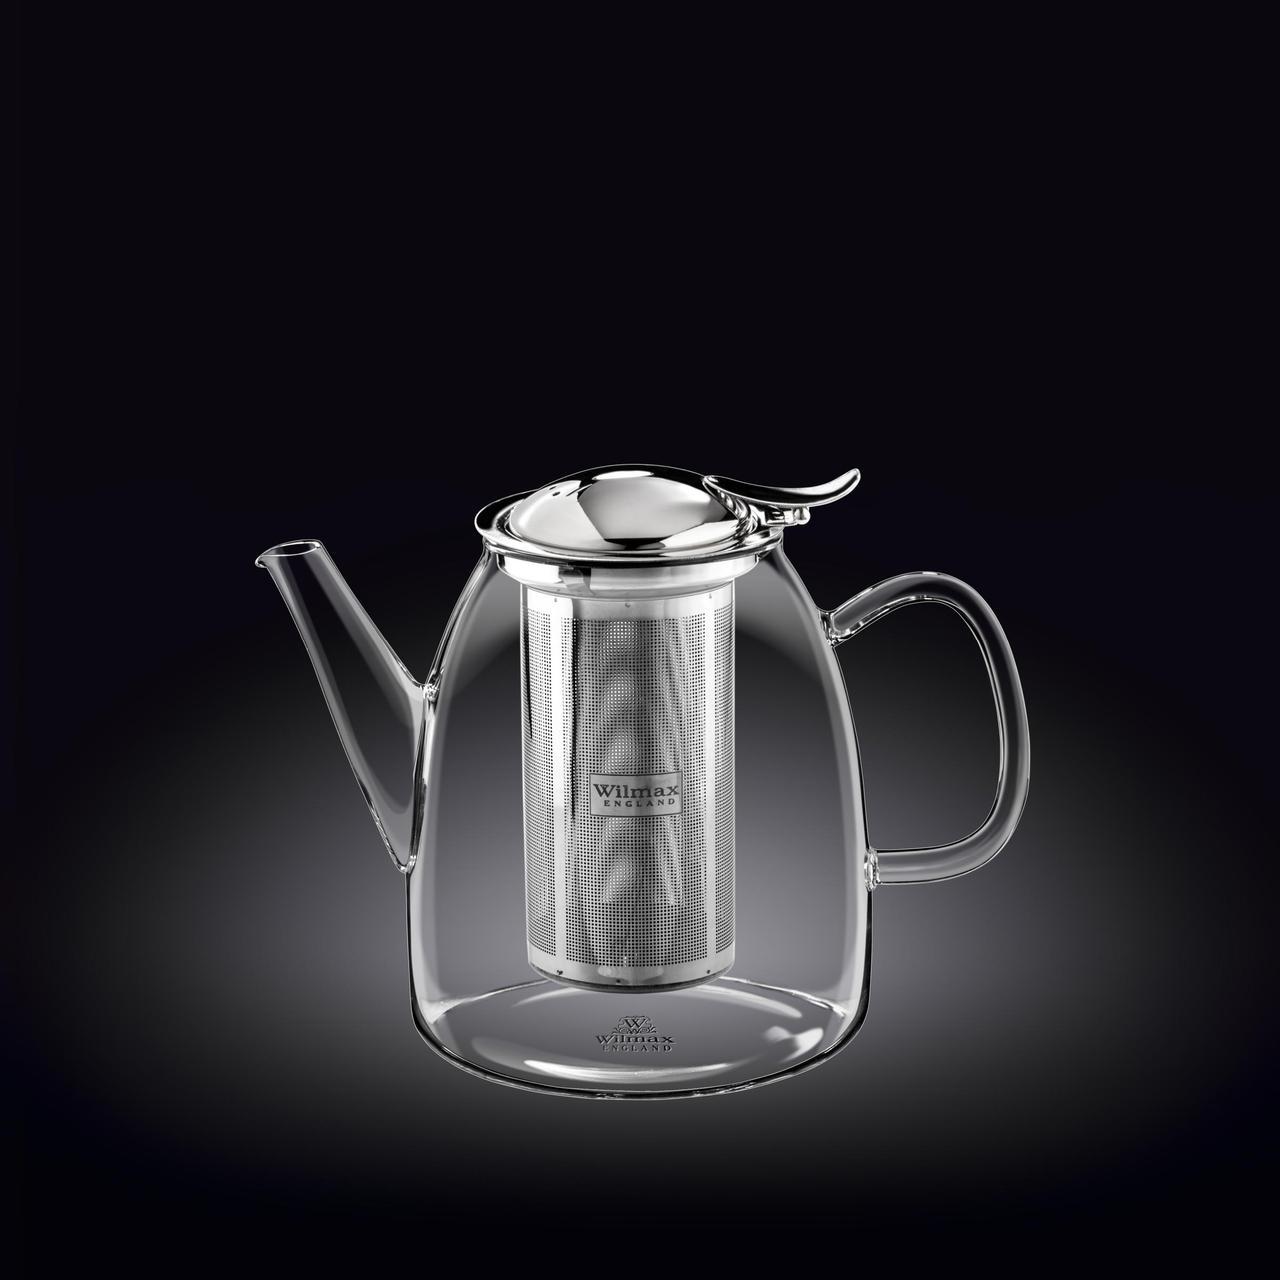 Чайник заварочный 600мл Thermo Wilmax Нержавеющий фильтр